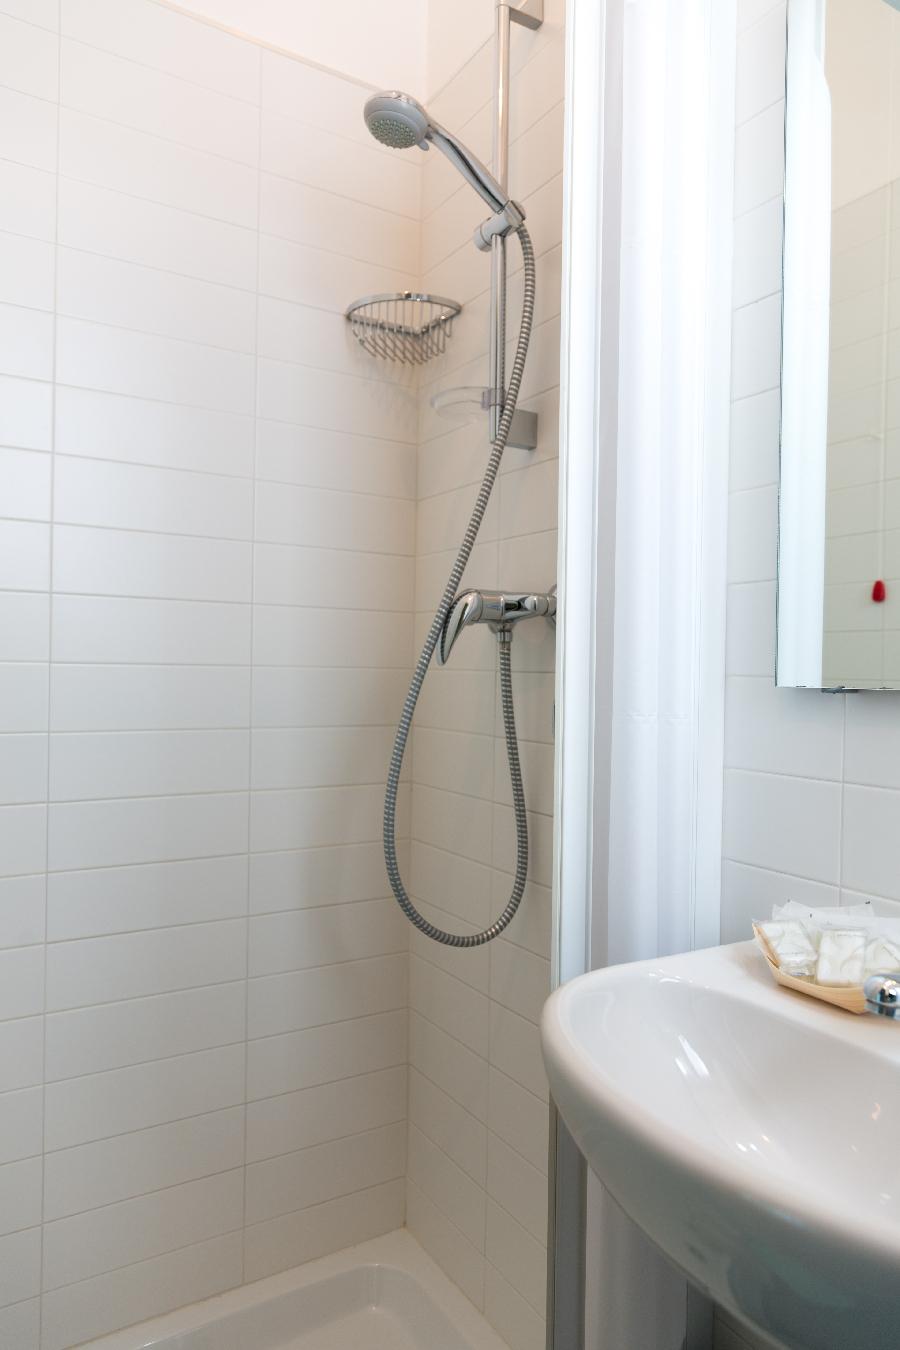 Miramare Hotel Dipendenza Tripla Comfort 27